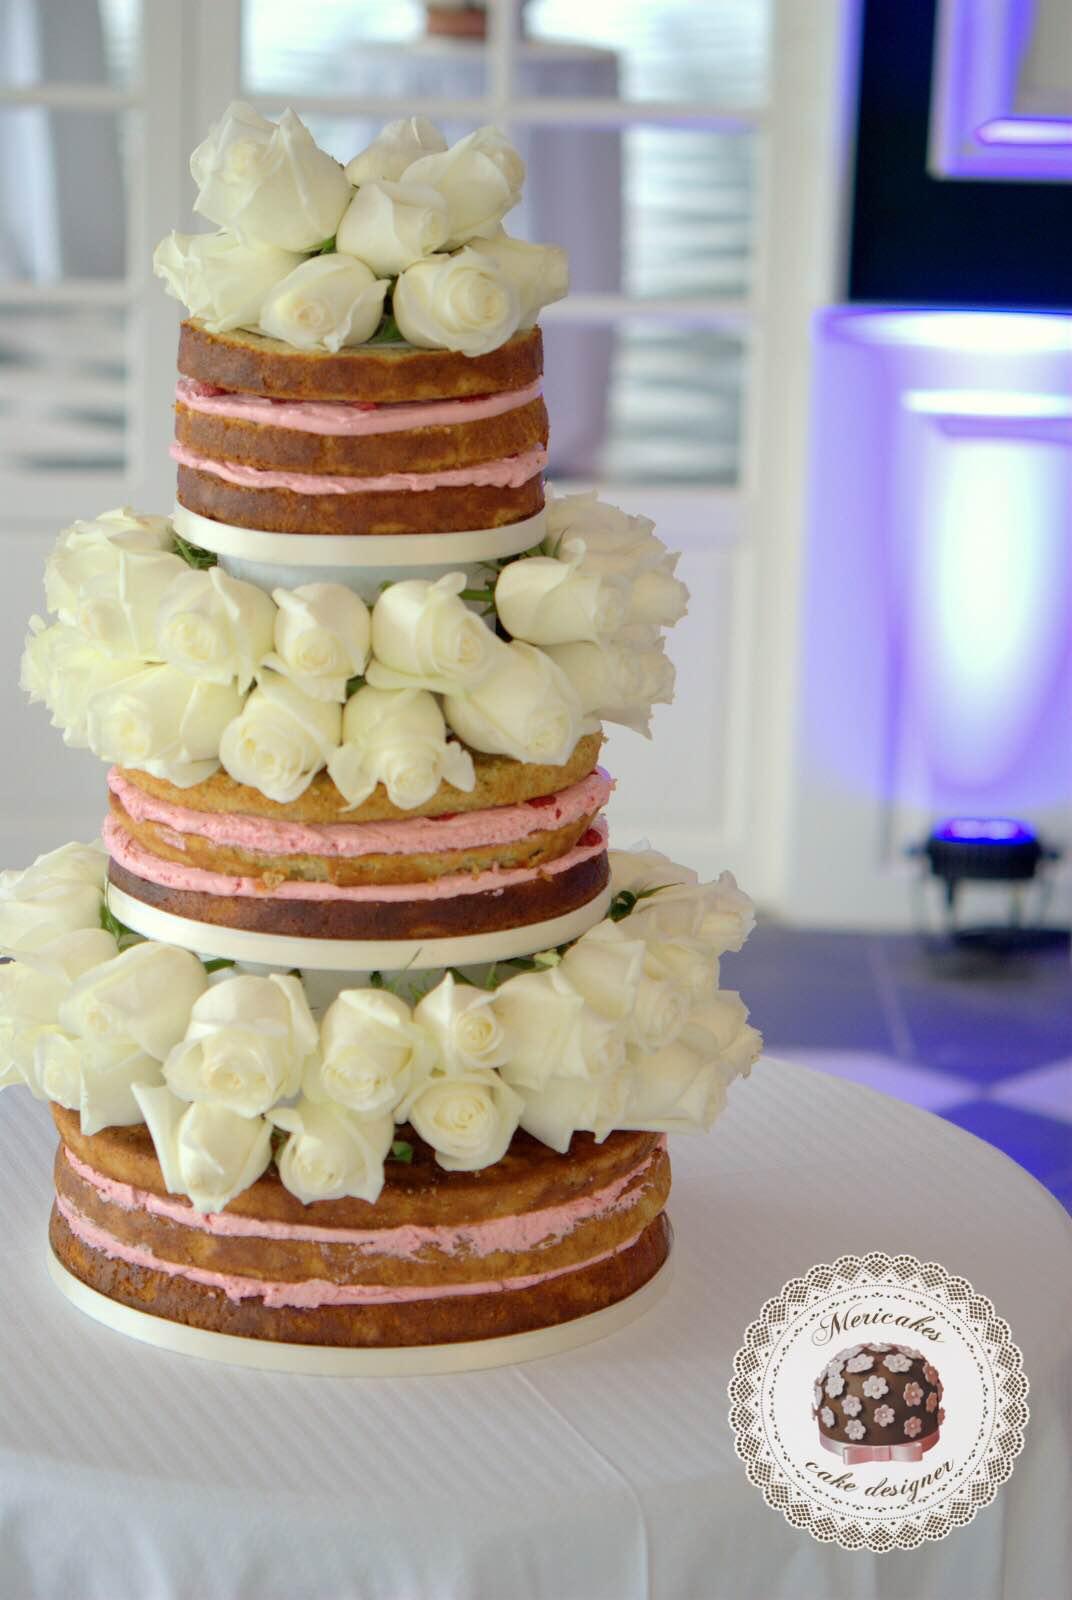 wedding-cake-kosher-barcelona-tarta-de-boda-naked-cake-jewish-wedding-mericakes-castell-de-san-marcal-17